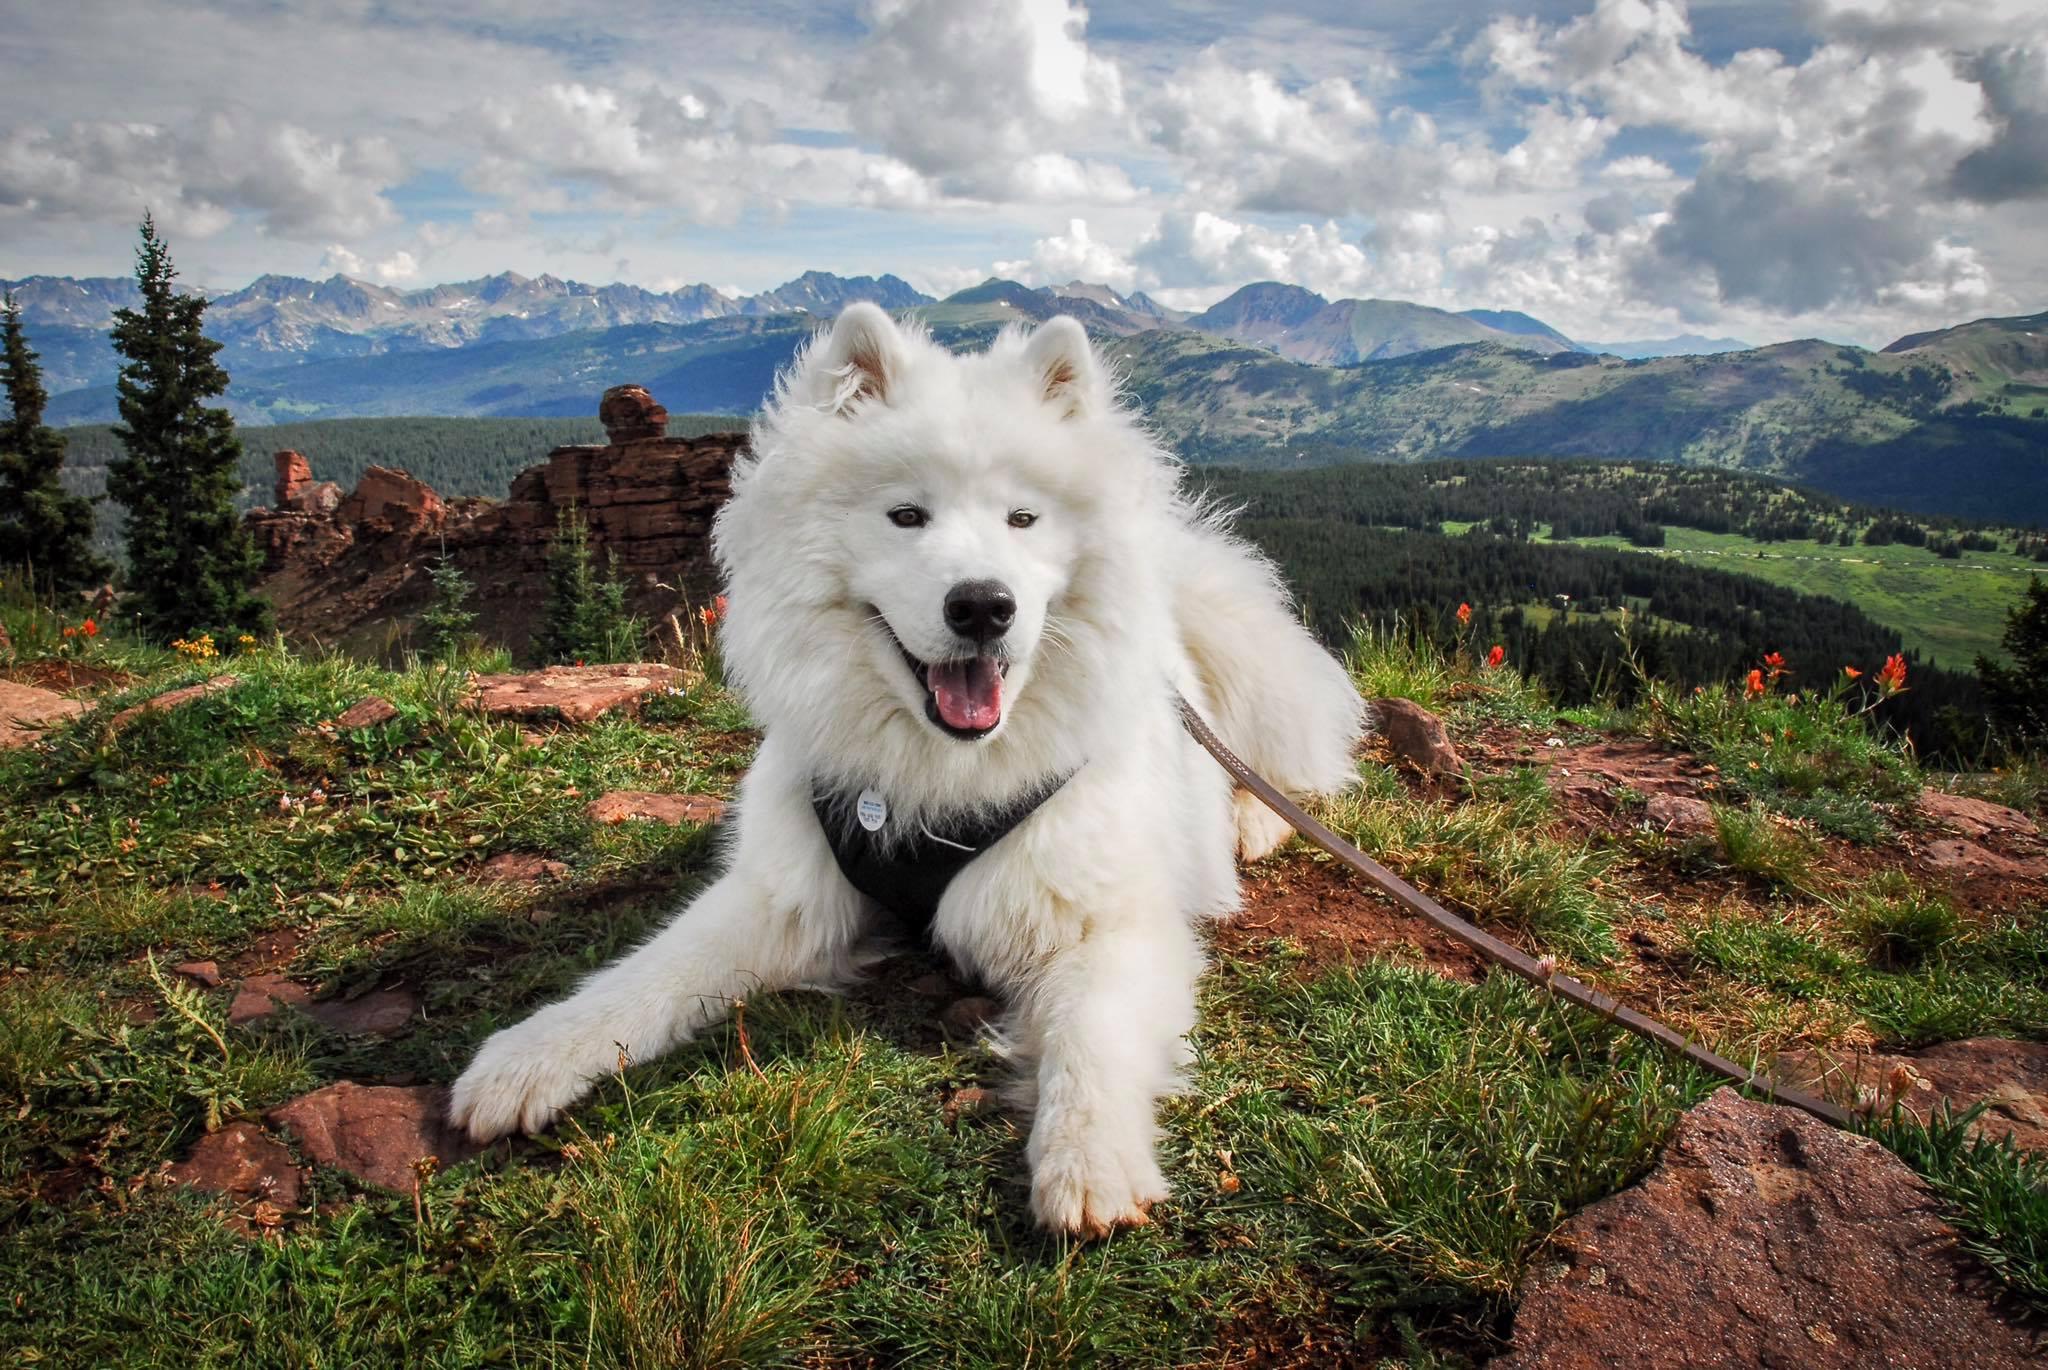 Puppy and Colorado Mountains